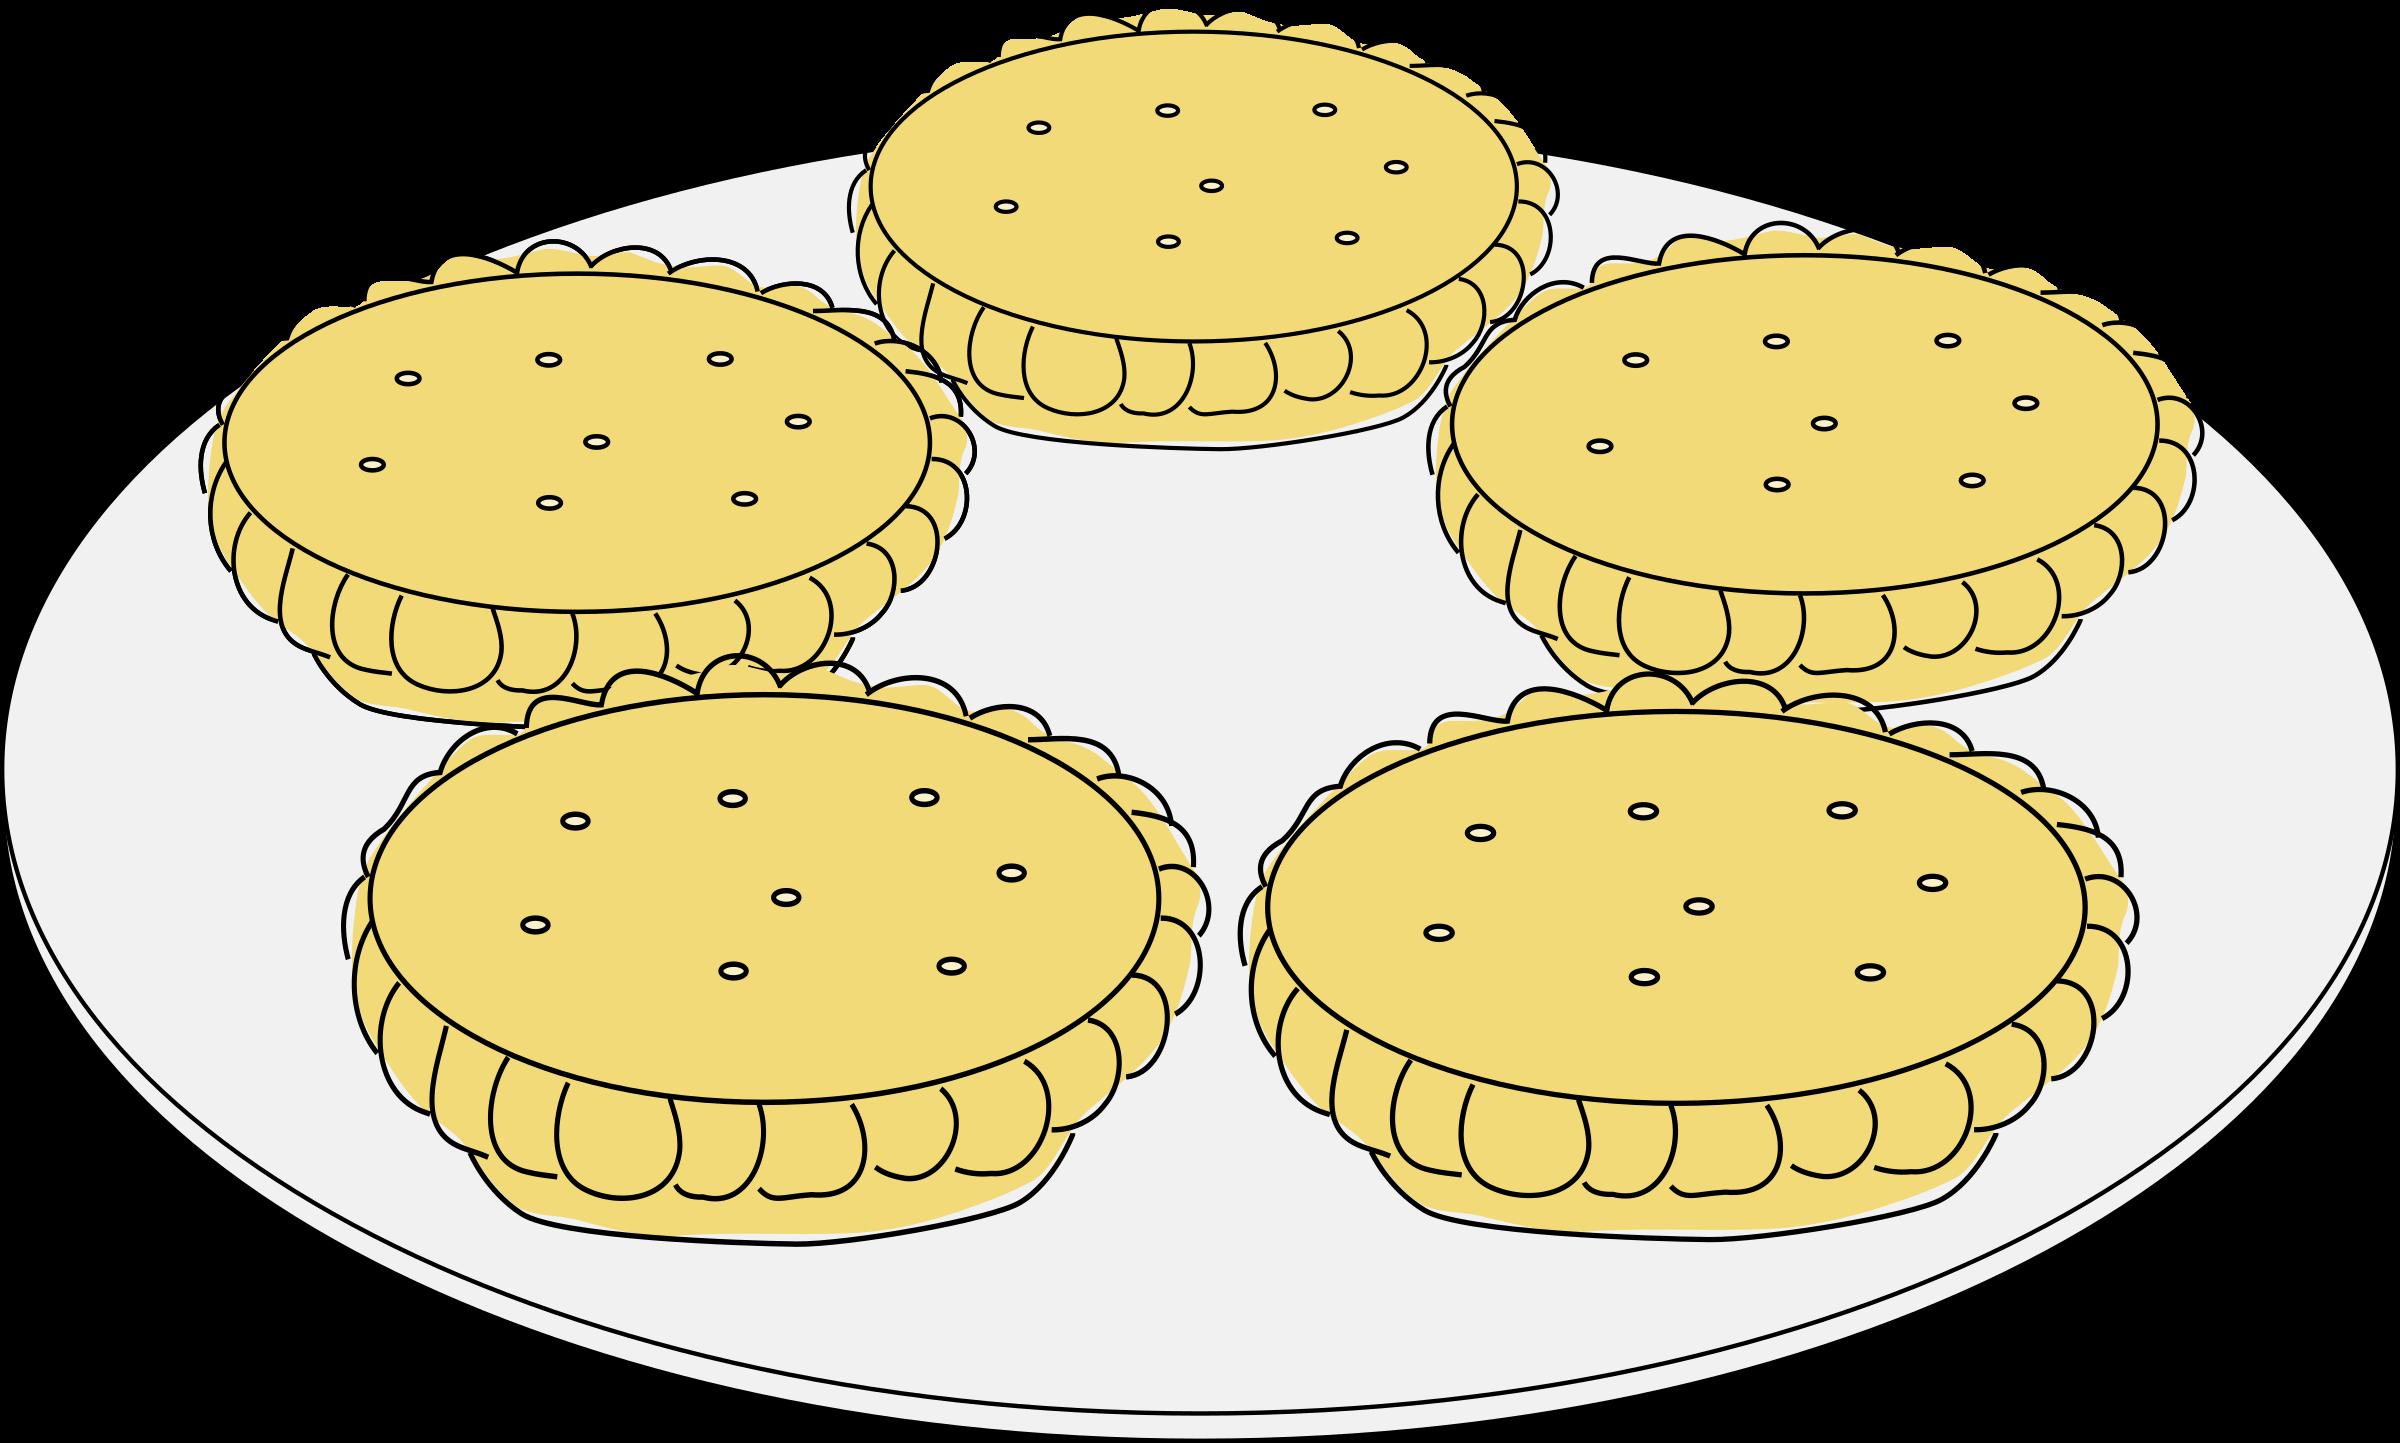 Apple pie slices clipart free clip freeuse stock Slice of pumpkin pie on plate free clip art - Clipartix - Hanslodge ... clip freeuse stock